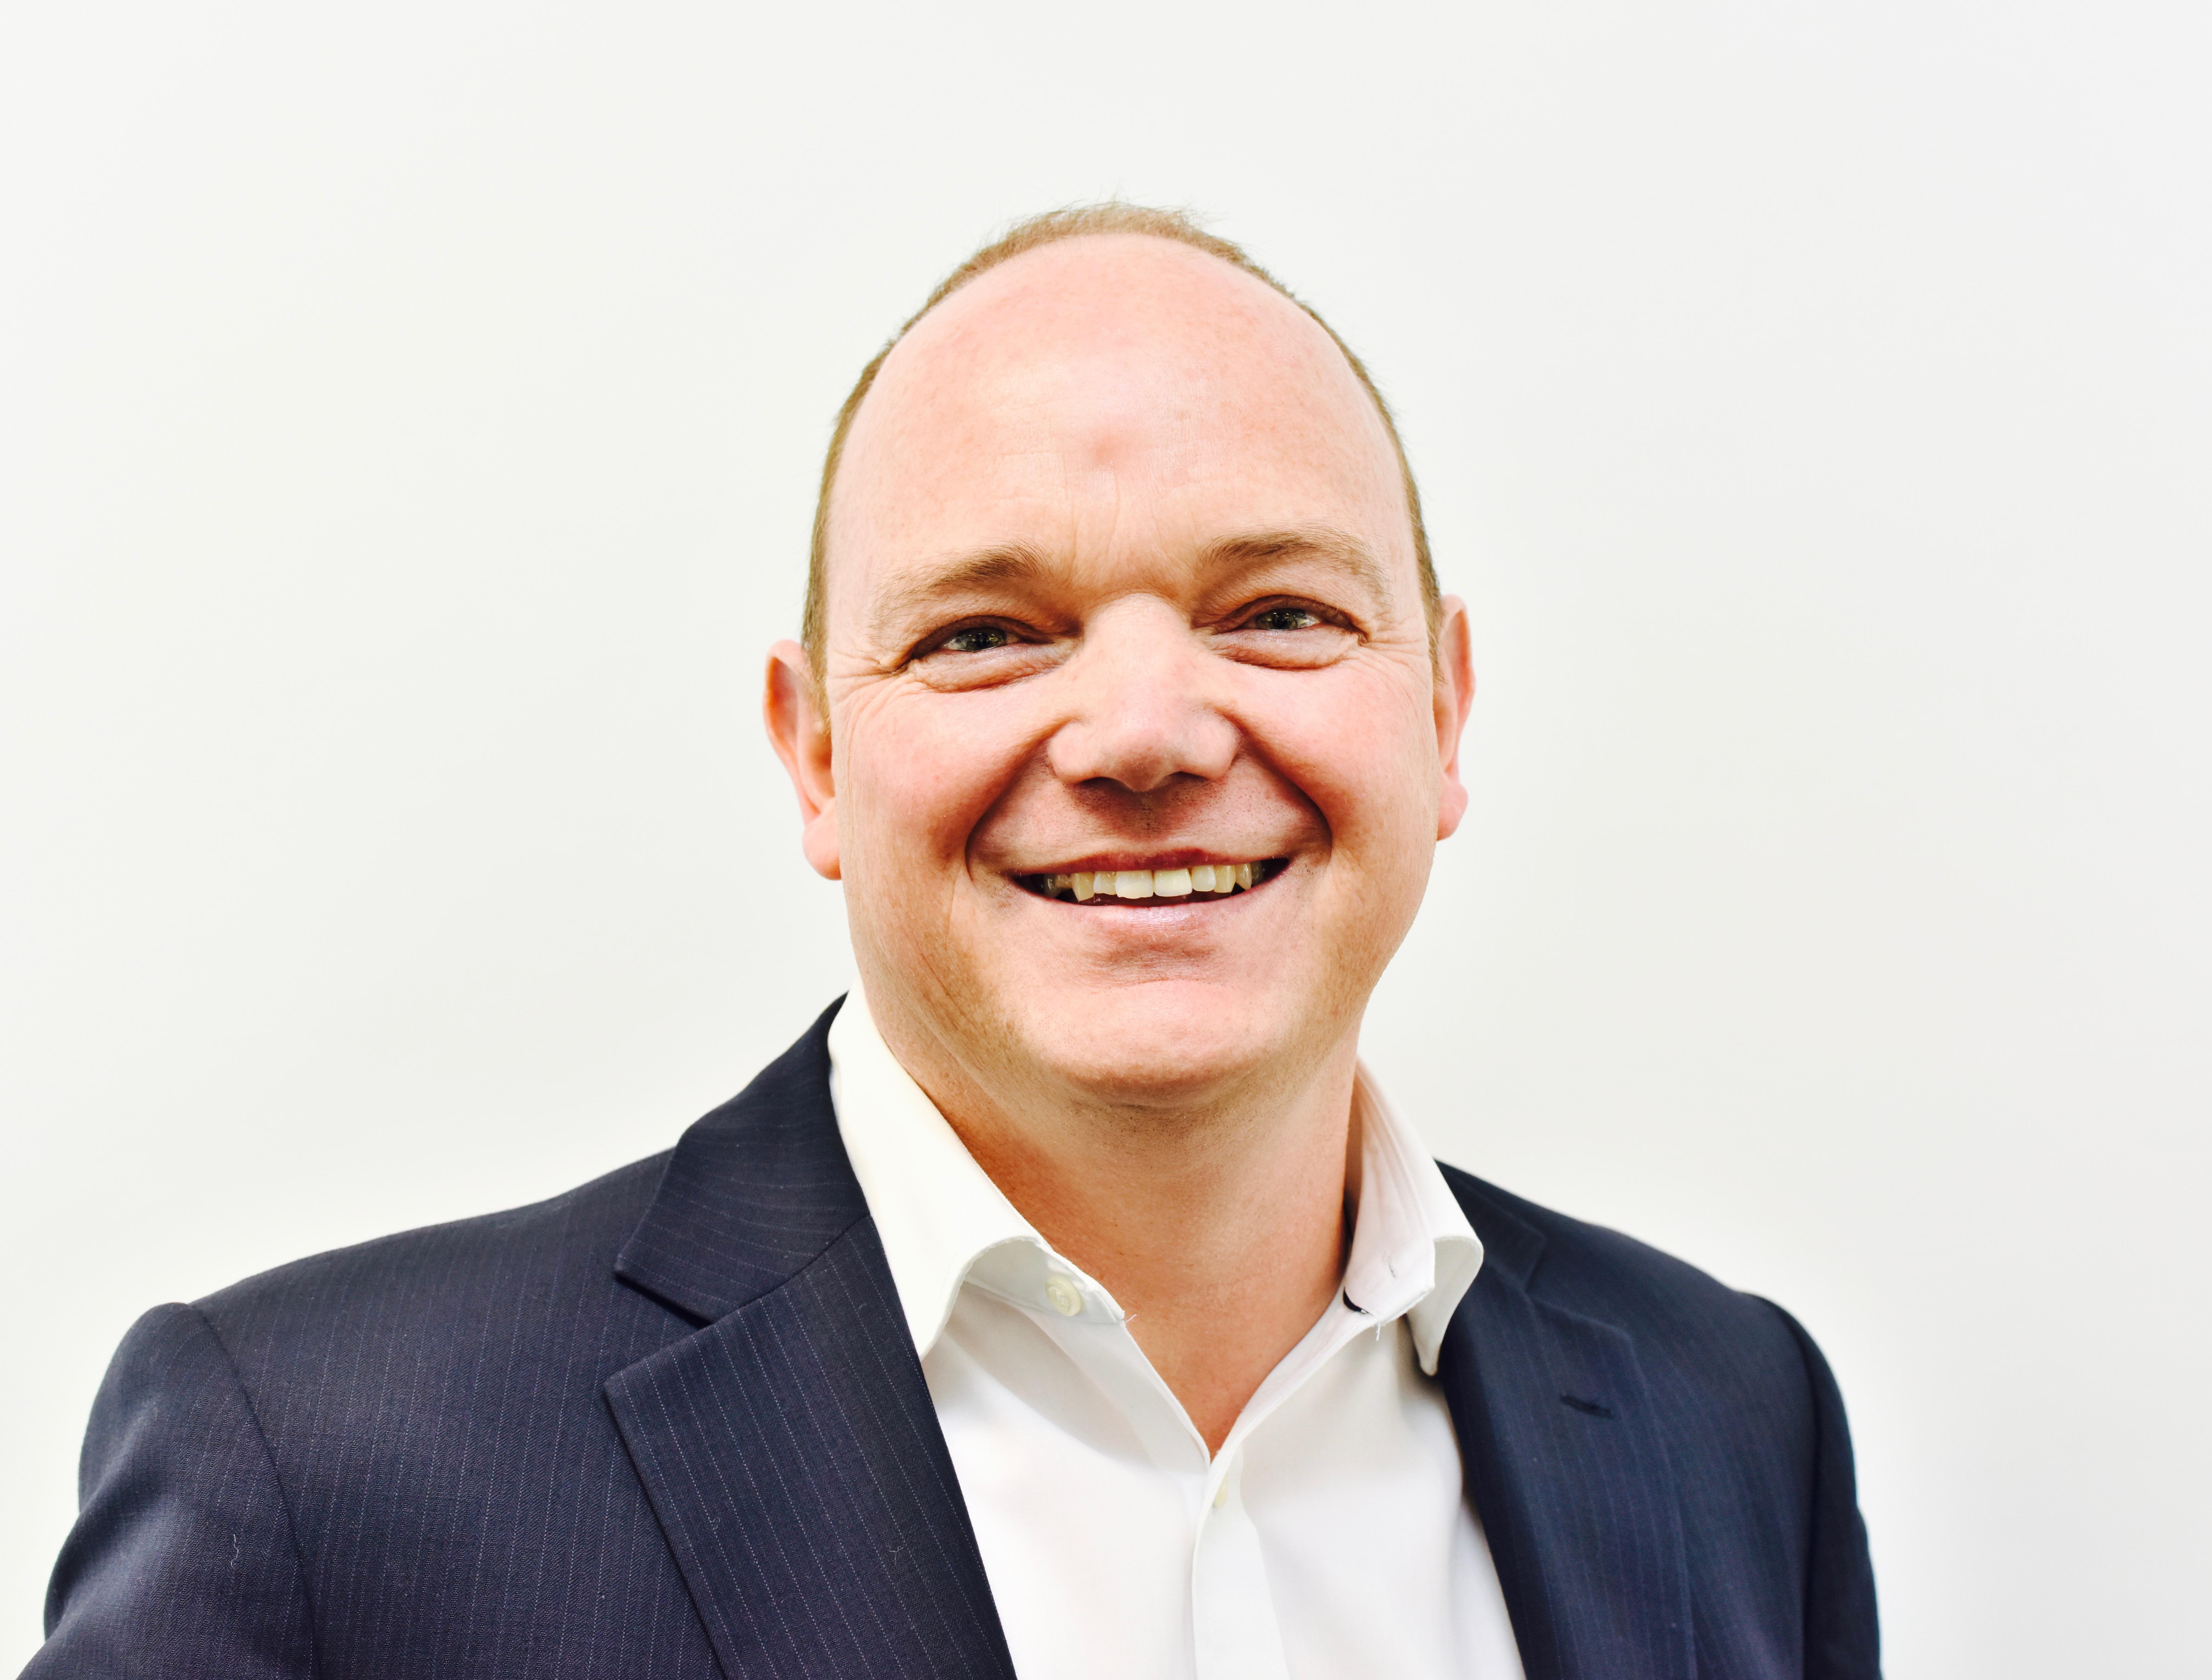 Chris Townsley, EMEA Director, CDNetworks